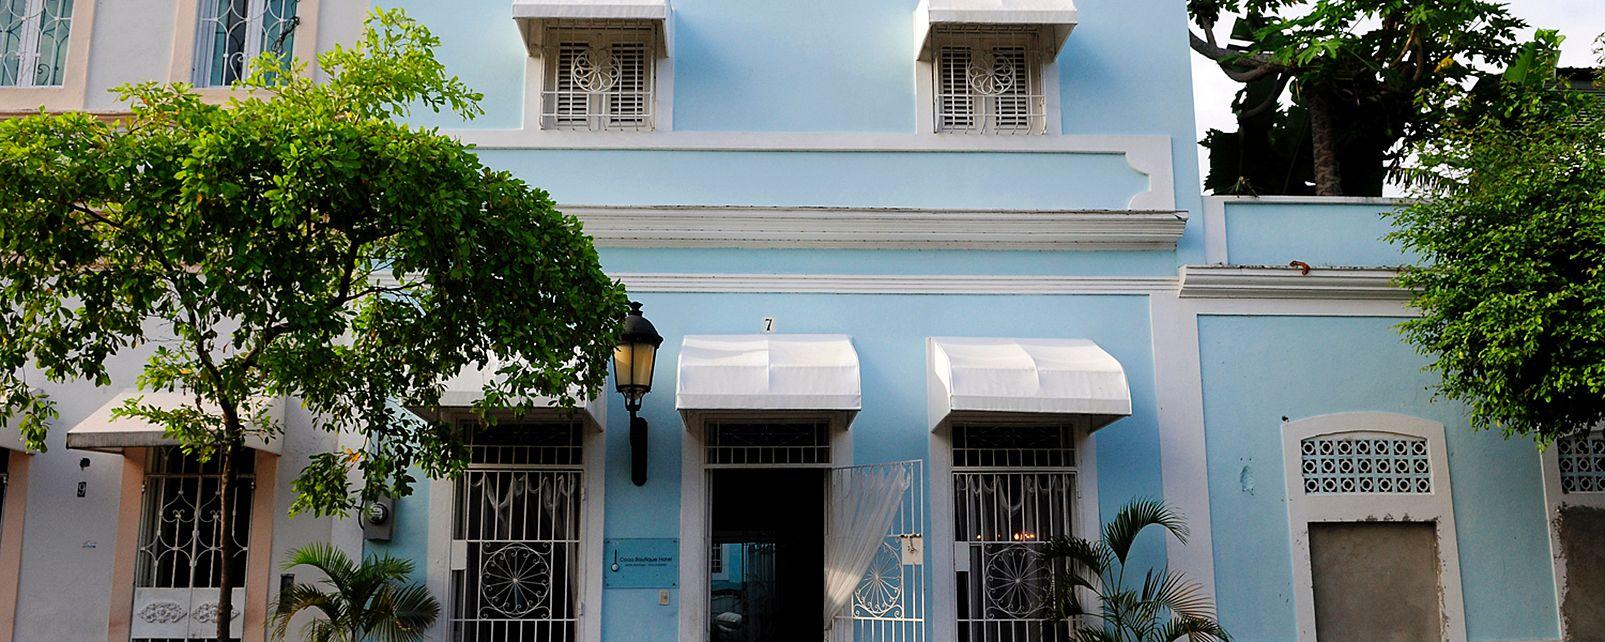 Hotel Coco Boutique Hotel